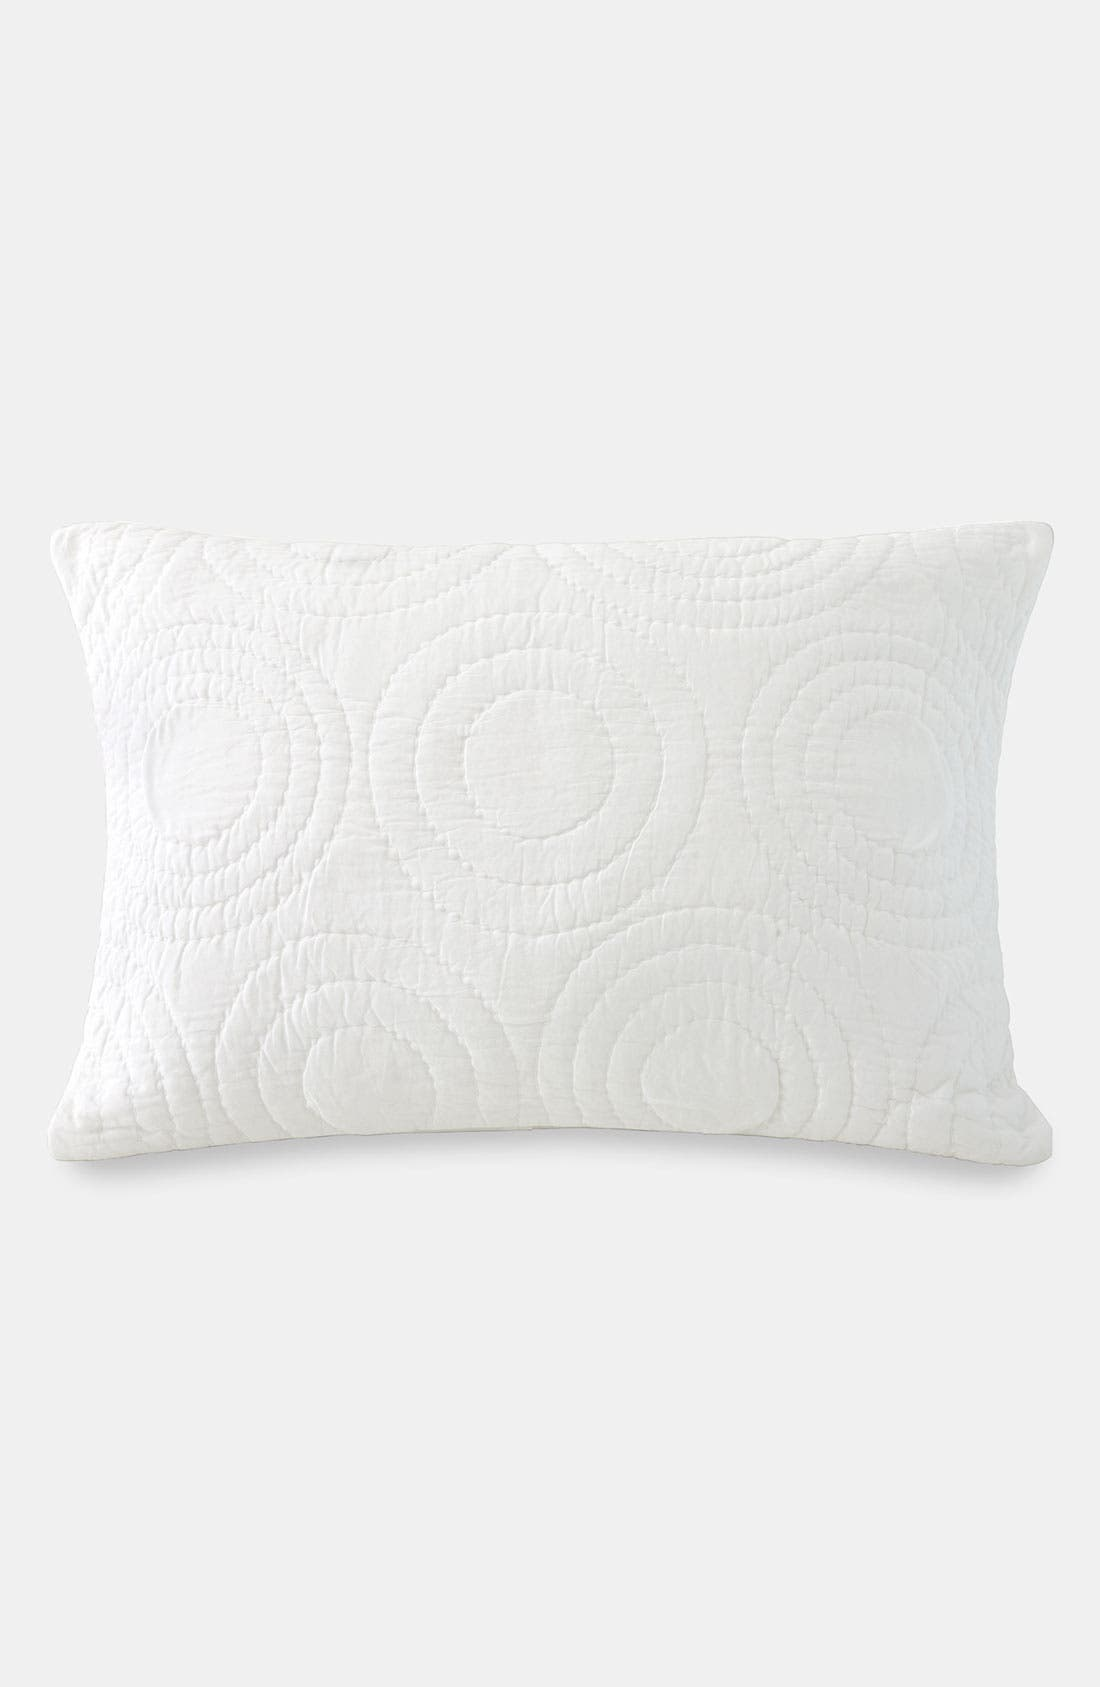 Alternate Image 1 Selected - DKNY 'Pure Romance' Pillow Sham